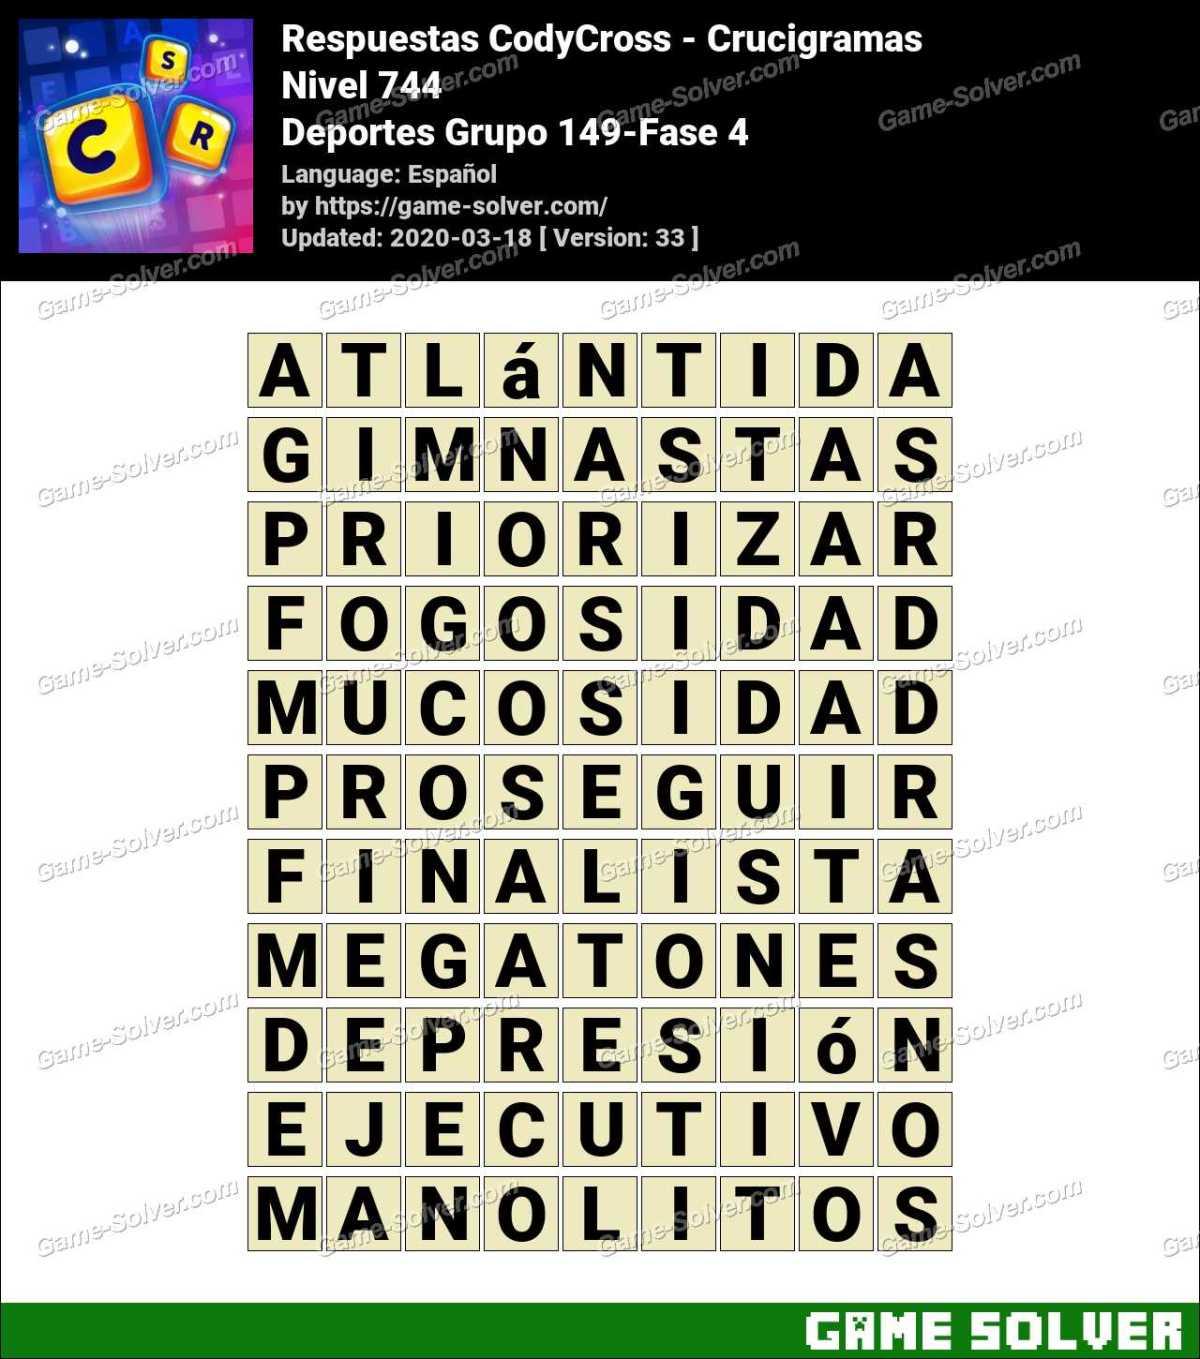 Respuestas CodyCross Deportes Grupo 149-Fase 4